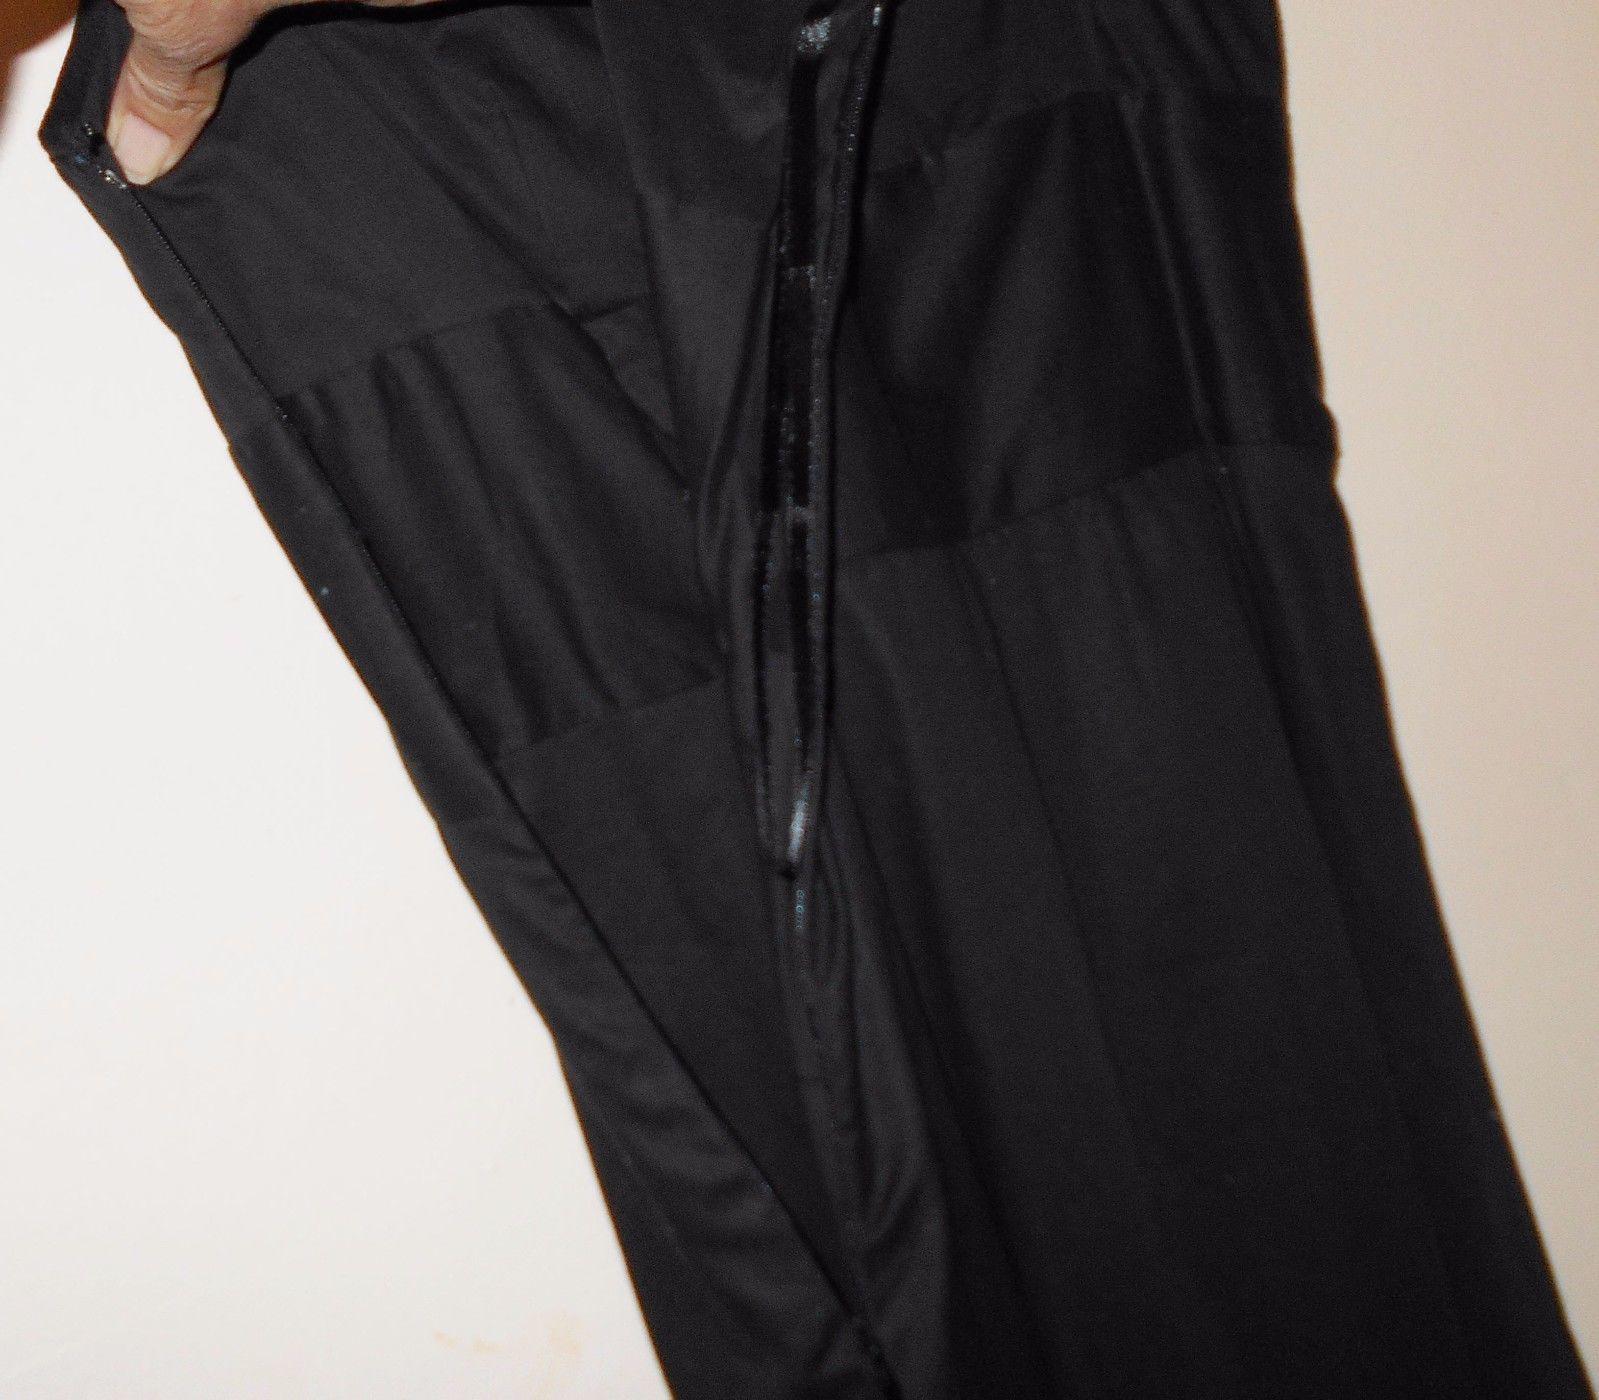 Dress Ann Taylor Loft NEW $99 Size 00 black white floral embroidery Resort trip